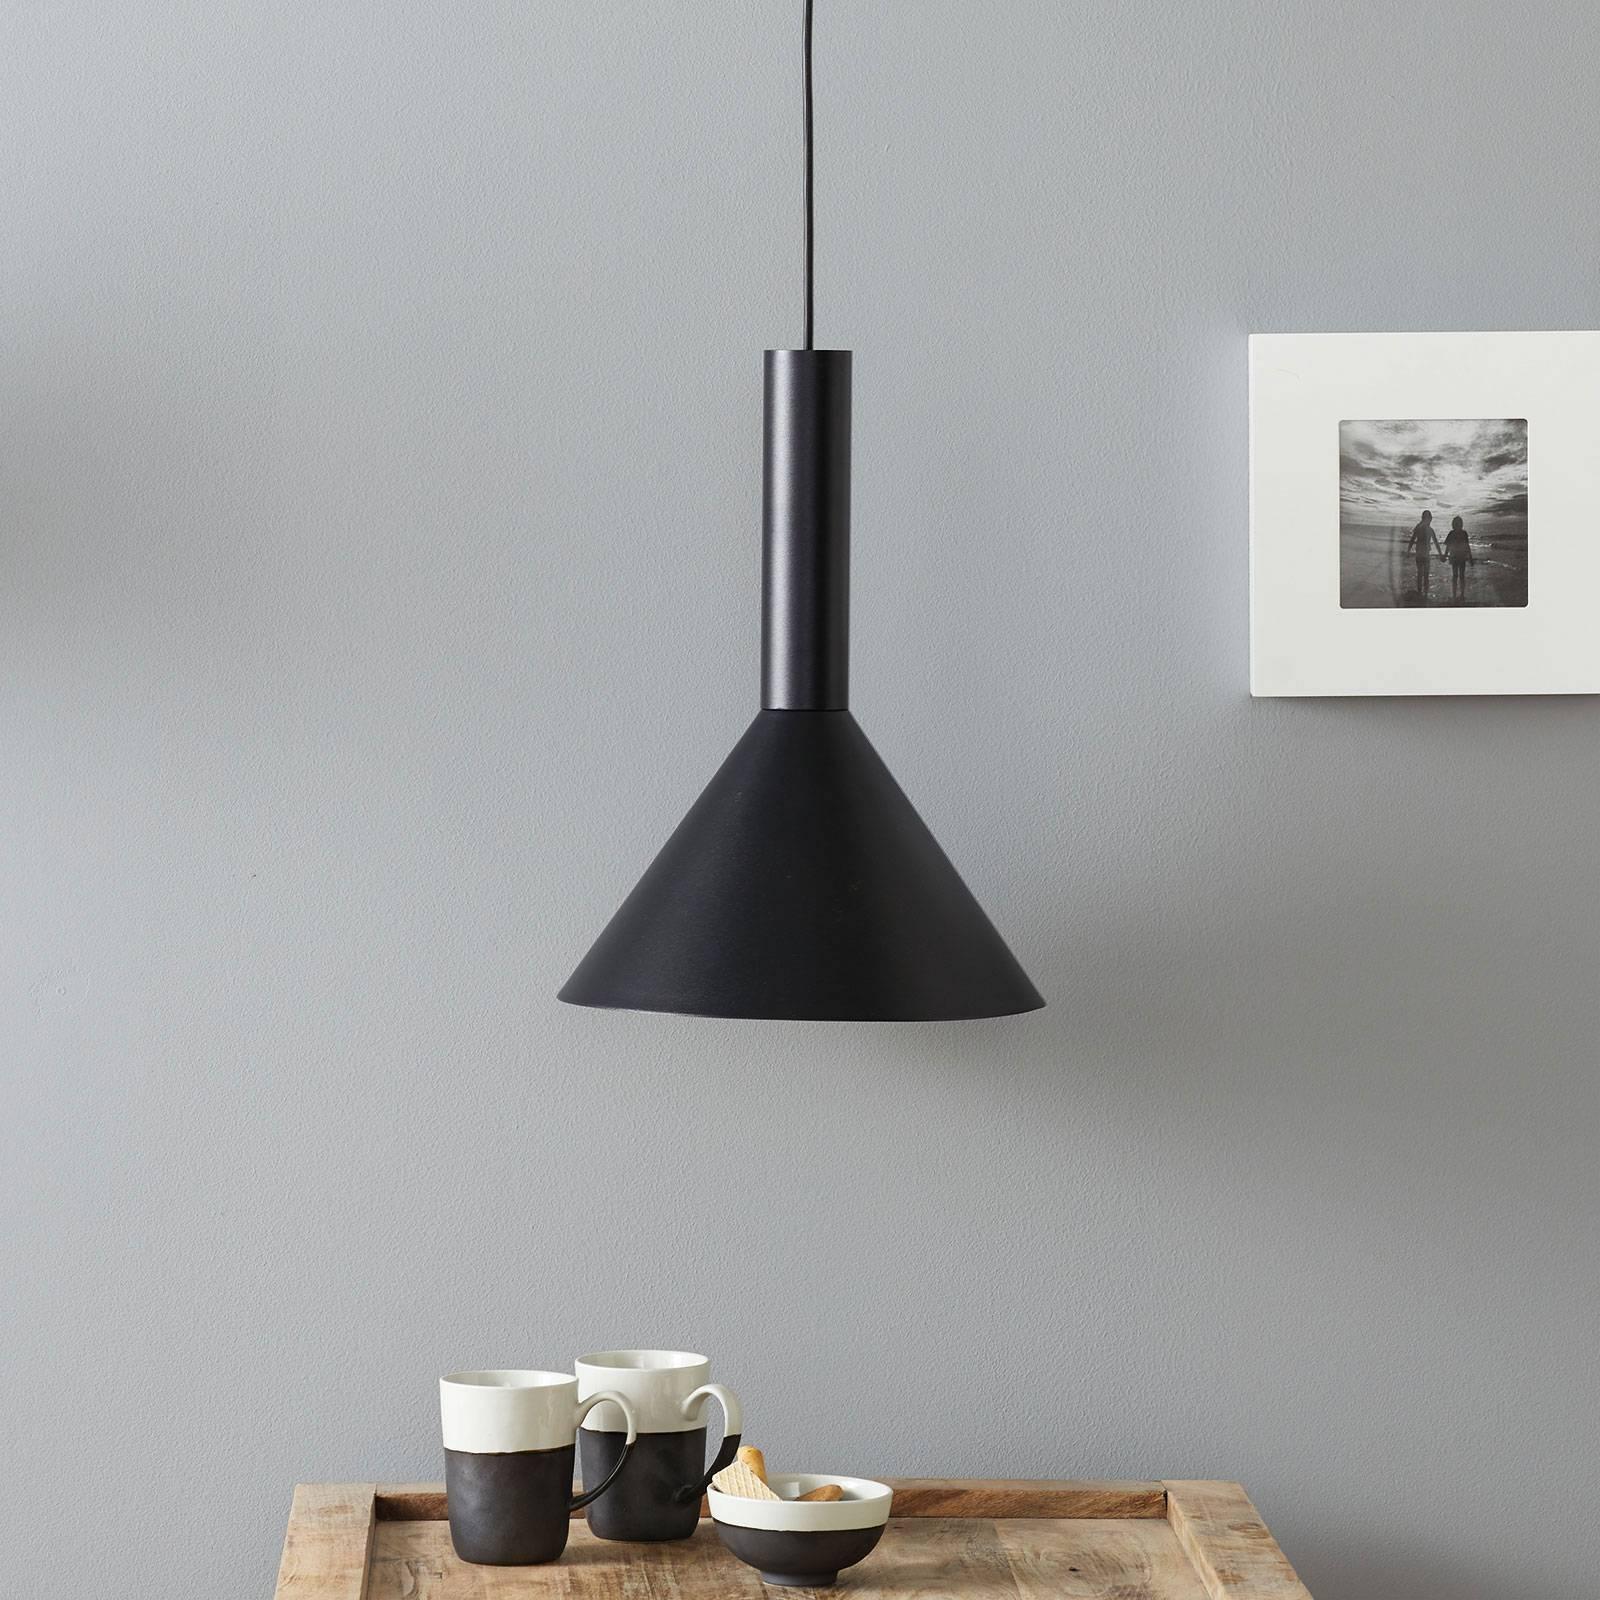 Lucande Caris hanglamp Ø30cm zwart/goud